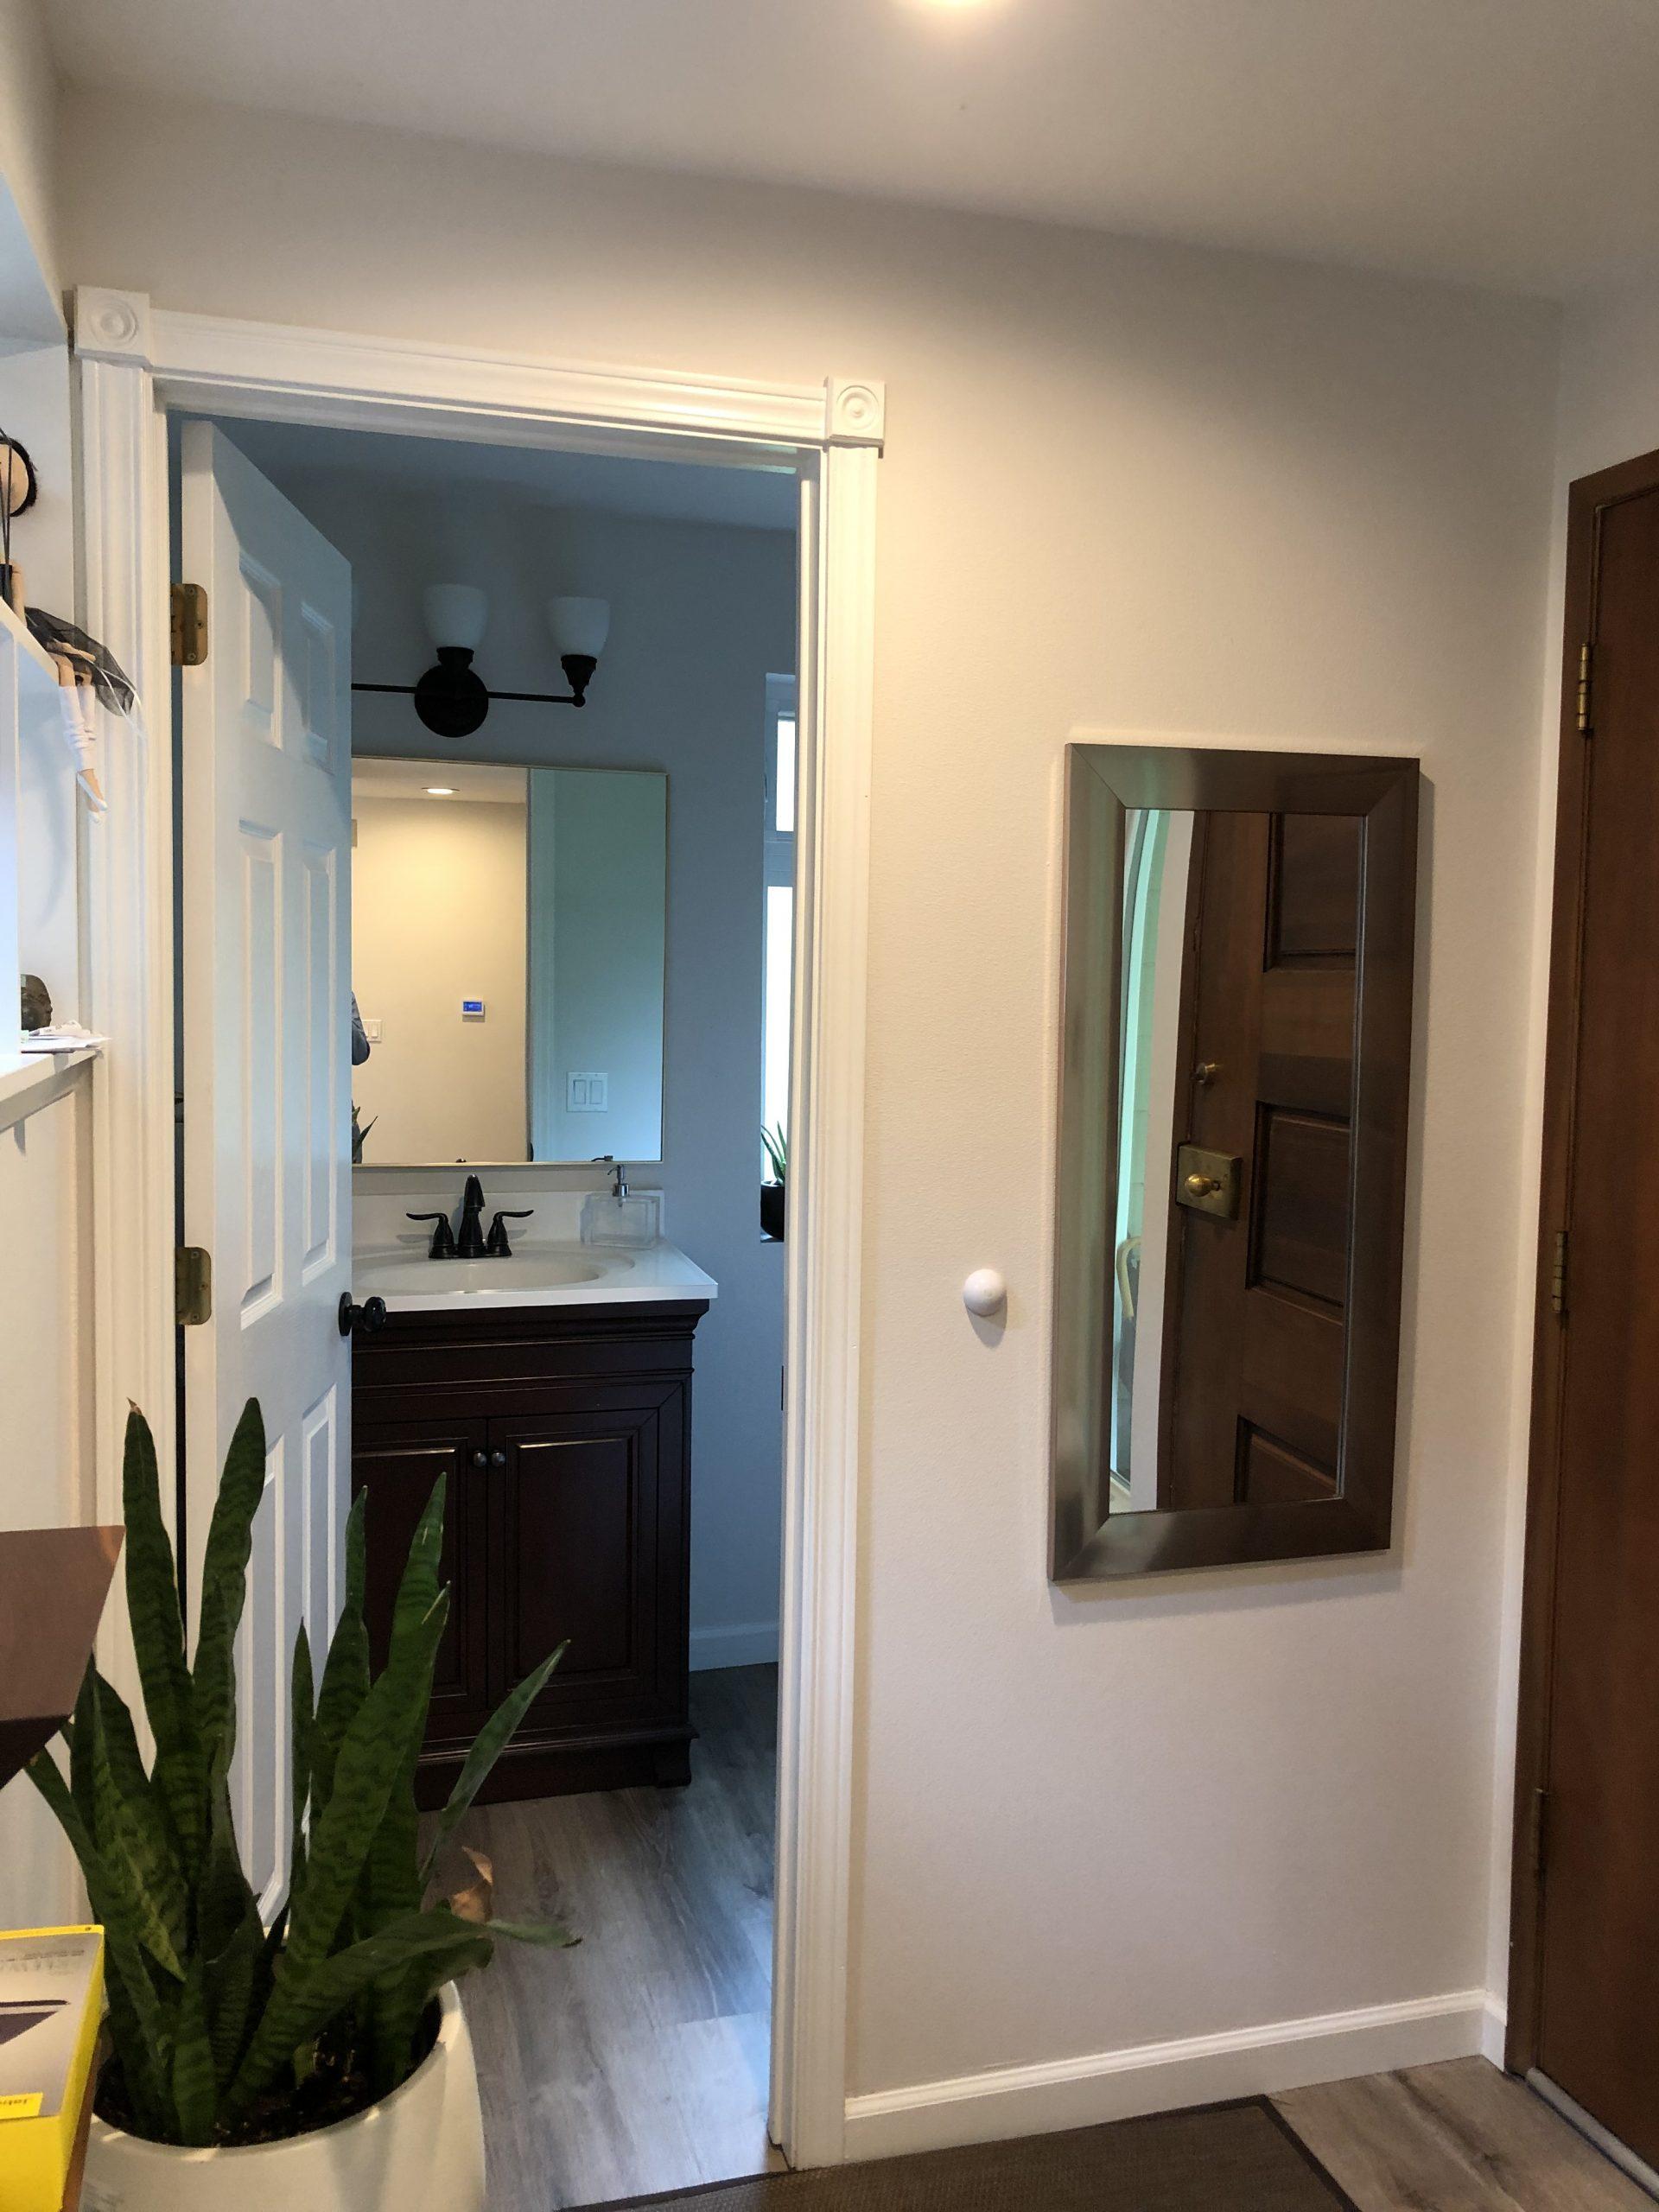 Powder room: half-bath water closet before shot from hallway